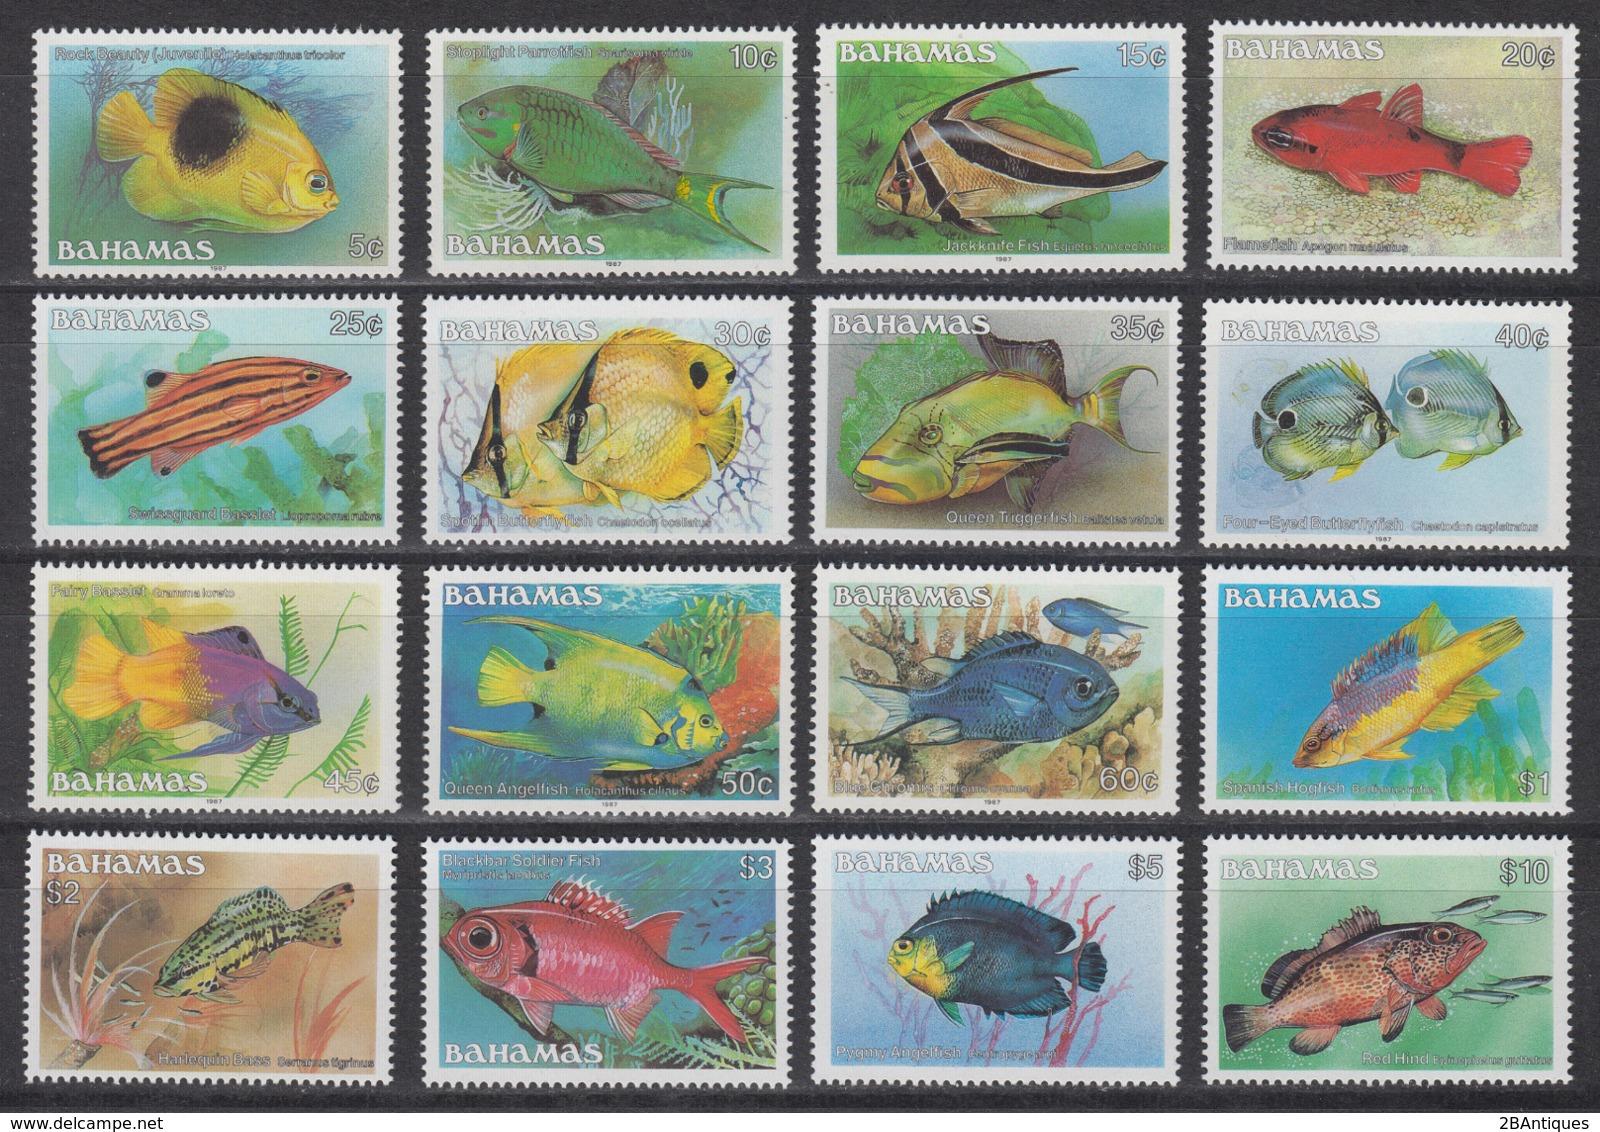 BAHAMAS 1986 - Fish COMPLETE SET MNH** XF - Bahamas (1973-...)